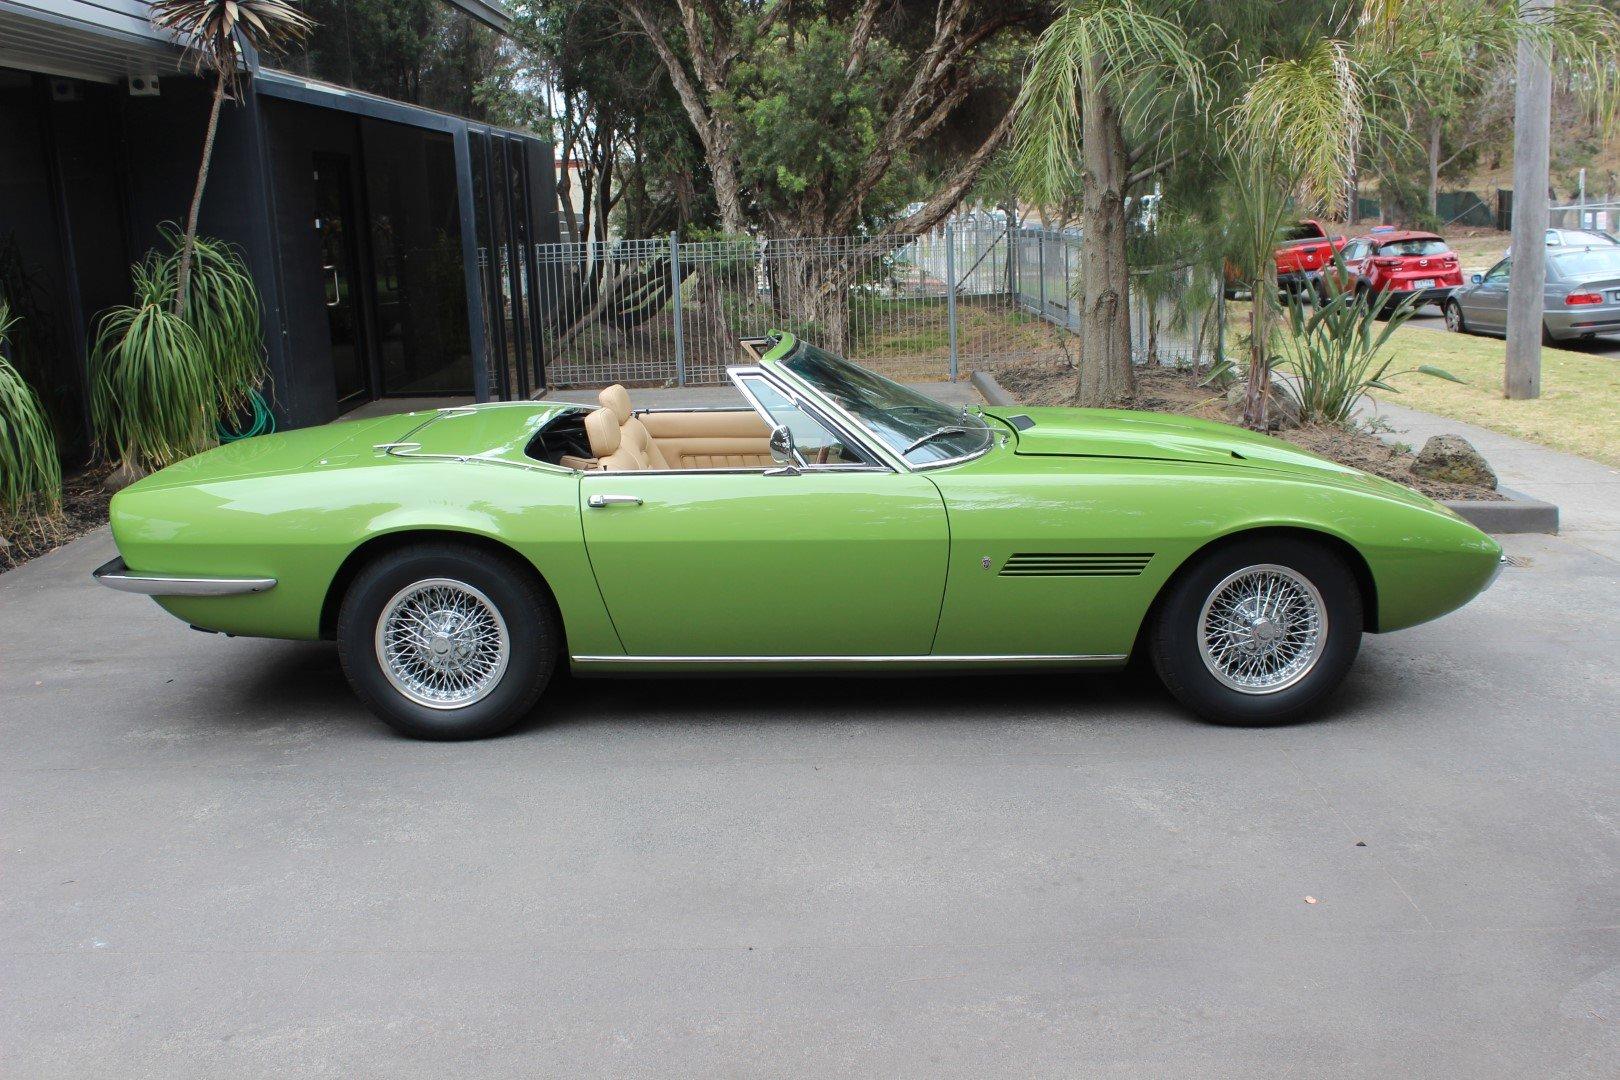 Maserati Ghibli 1969 For Sale (picture 2 of 6)